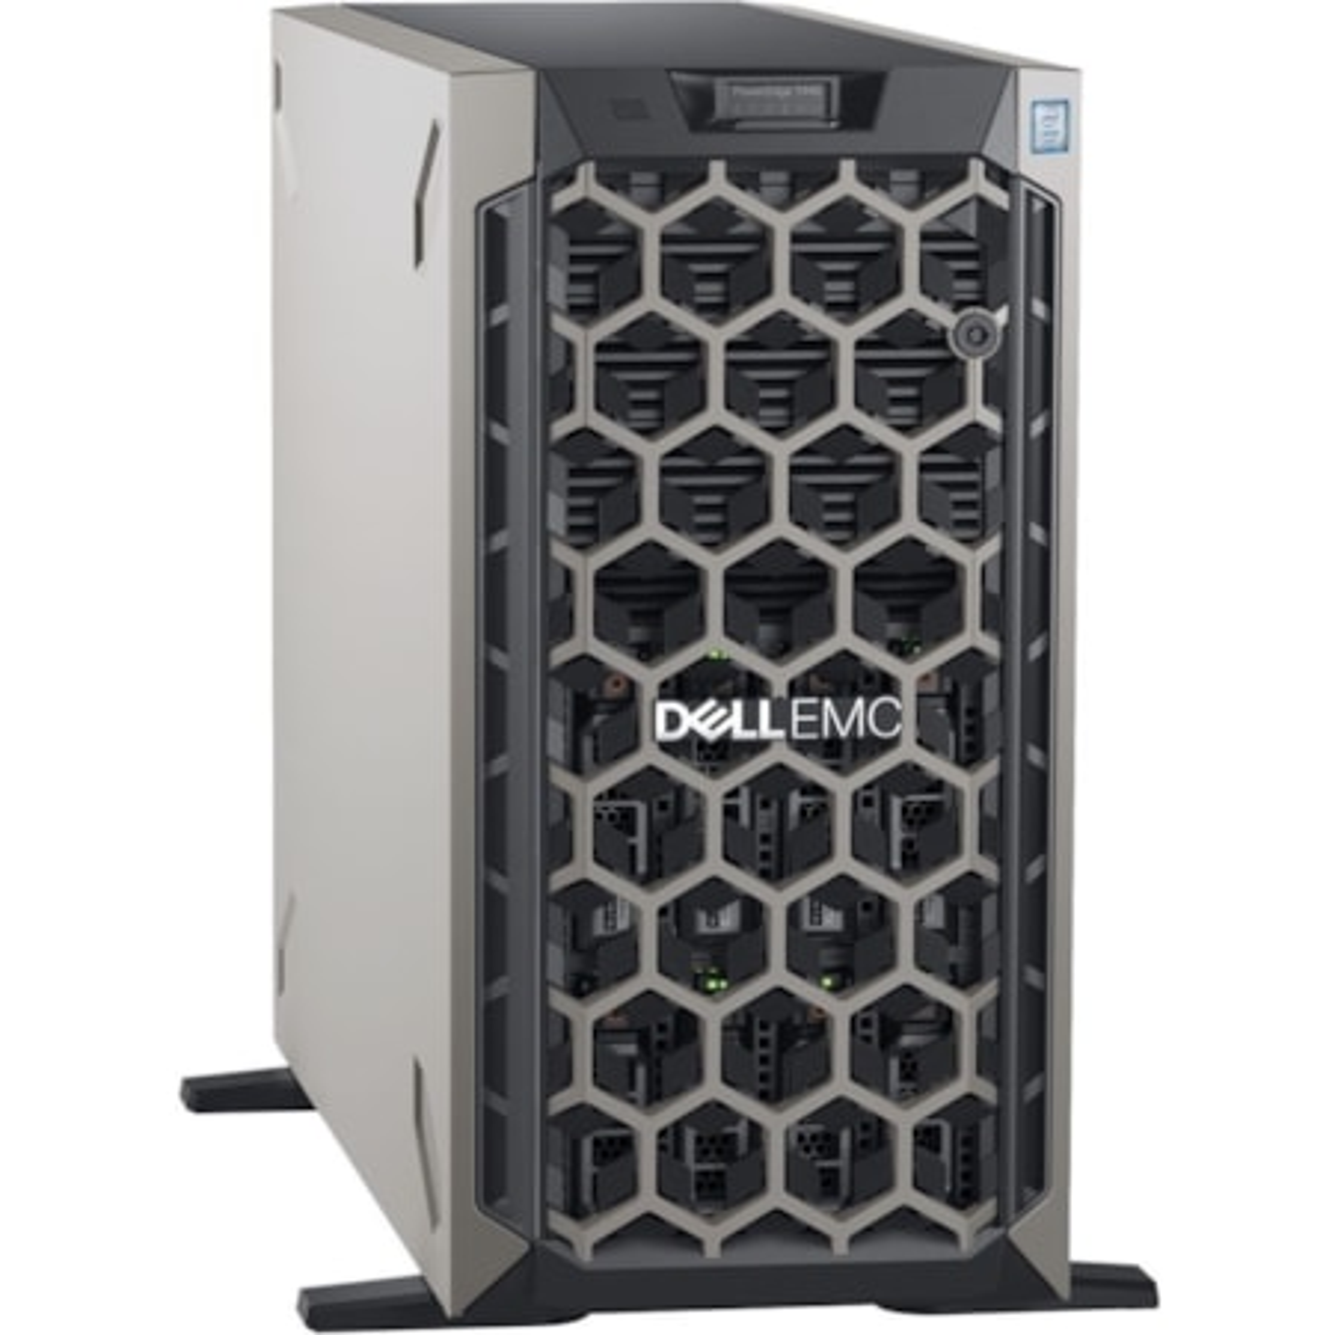 Dell EMC PowerEdge T440 5U Tower Server - Xeon Silver 4210 - 16 GB RAM - 1 TB HDD - 12Gb/s SAS, Serial ATA/600 Controller